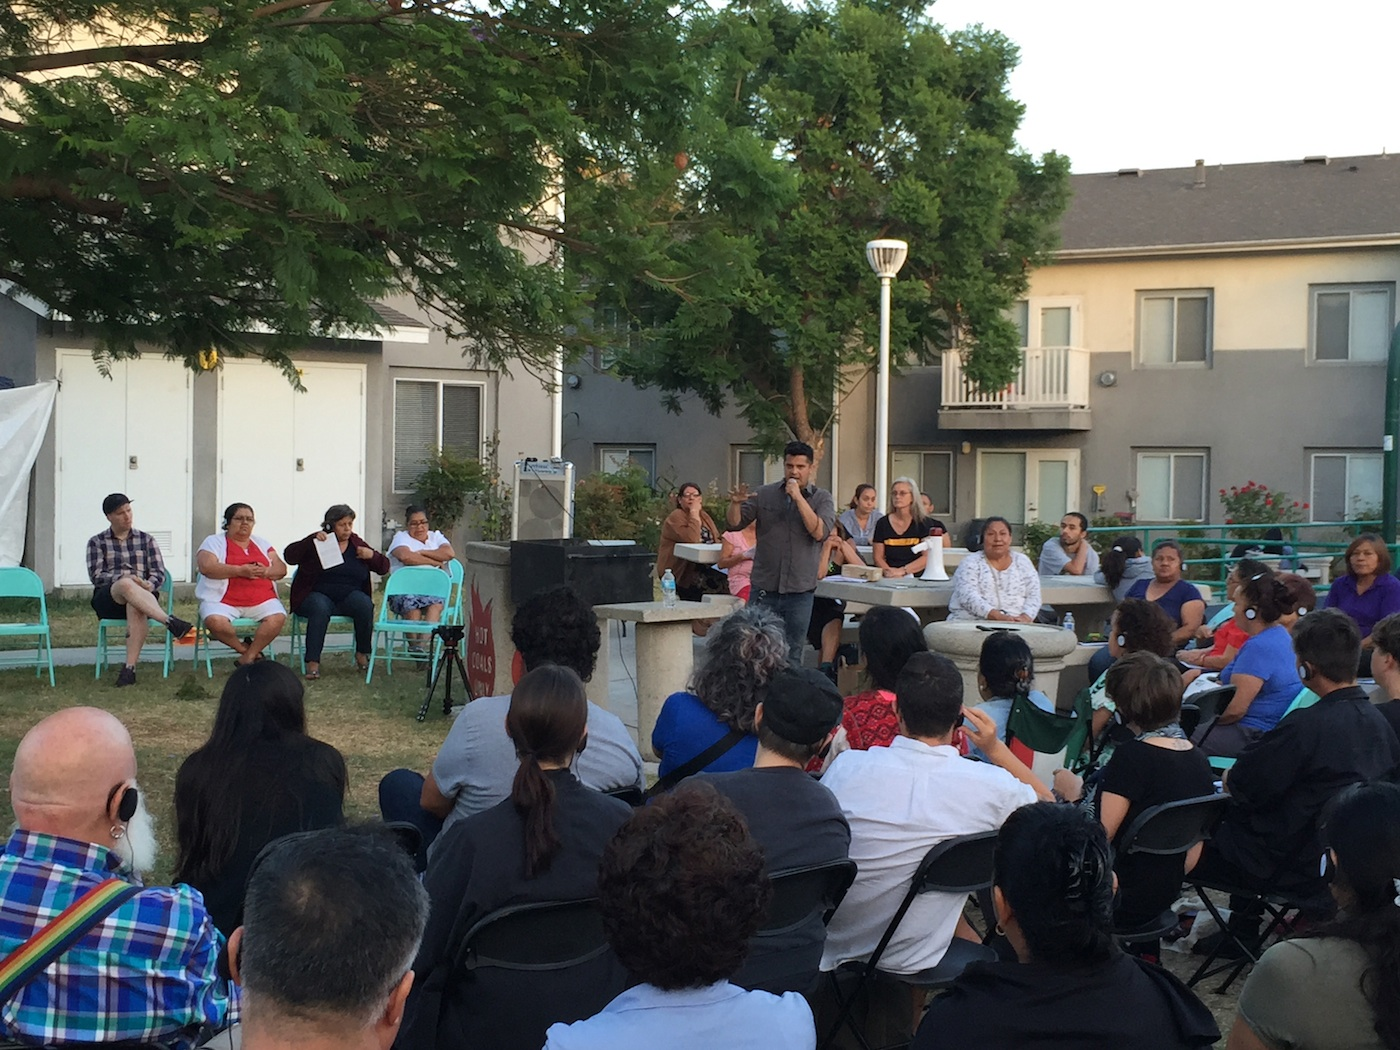 Rigo Amavizca addresses the crowd at Pico Gardens